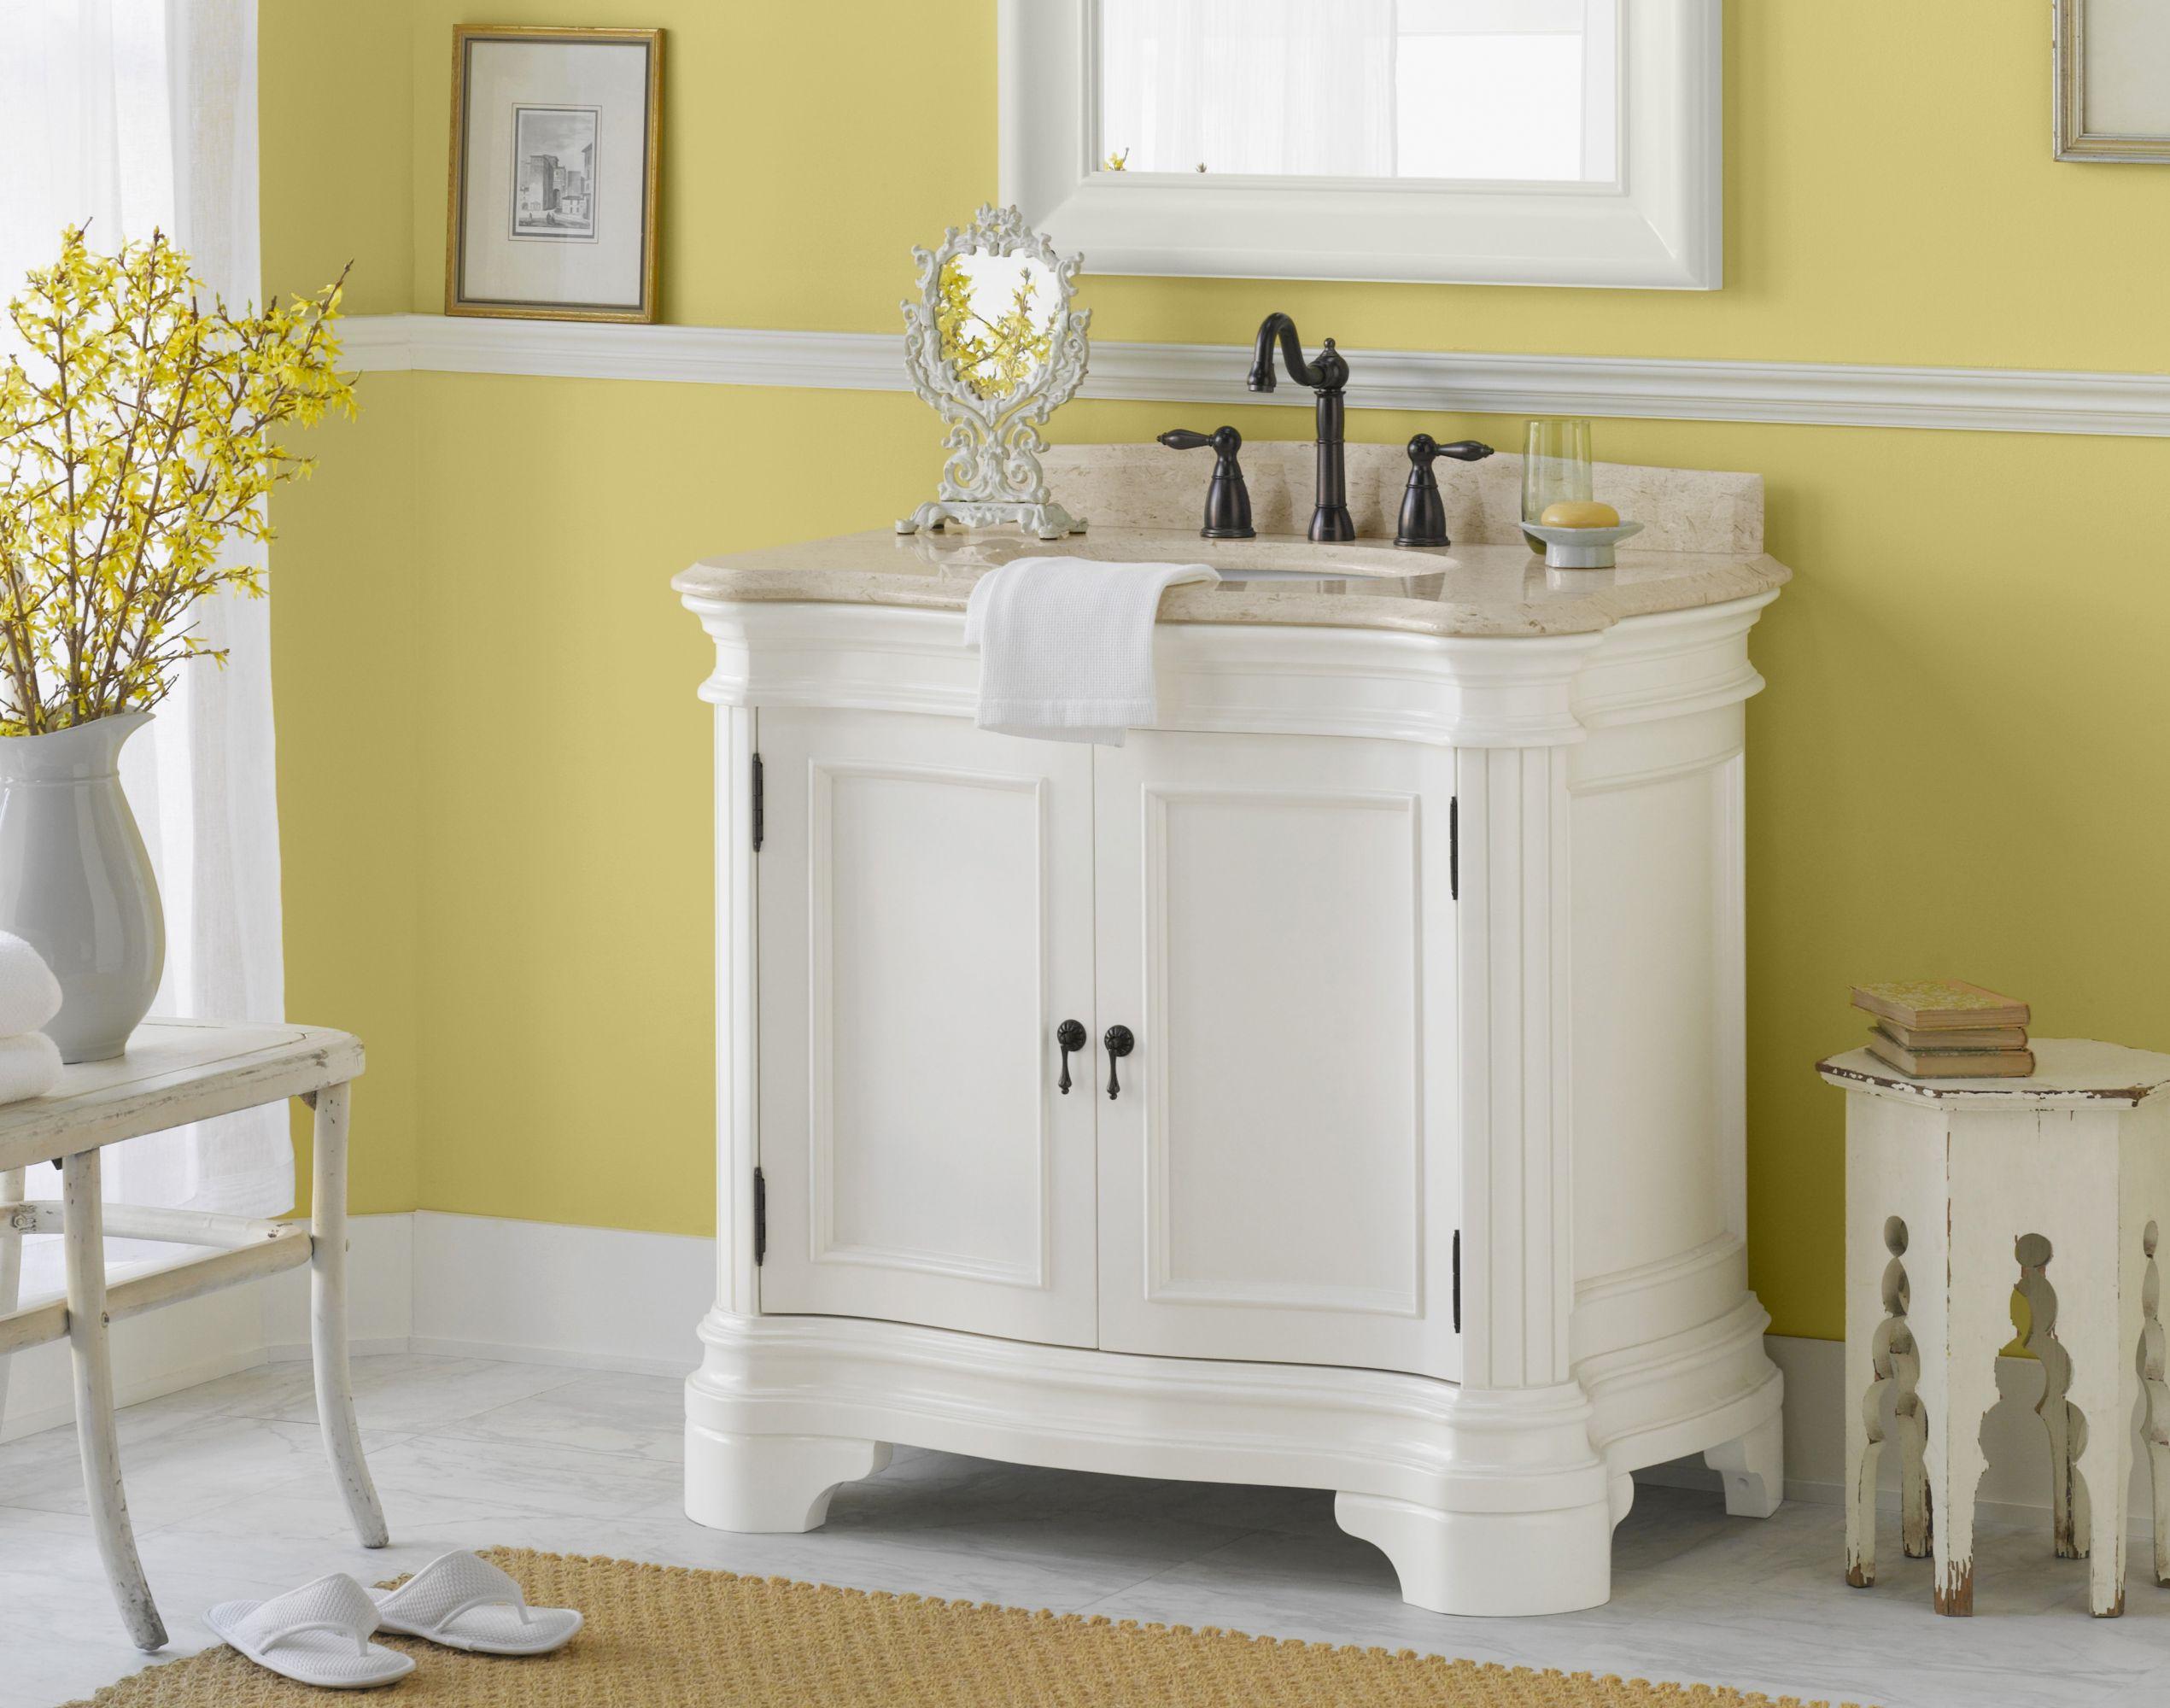 Vanity Counters | Ronbow Vanity Prices | Ronbow Vanity Tops